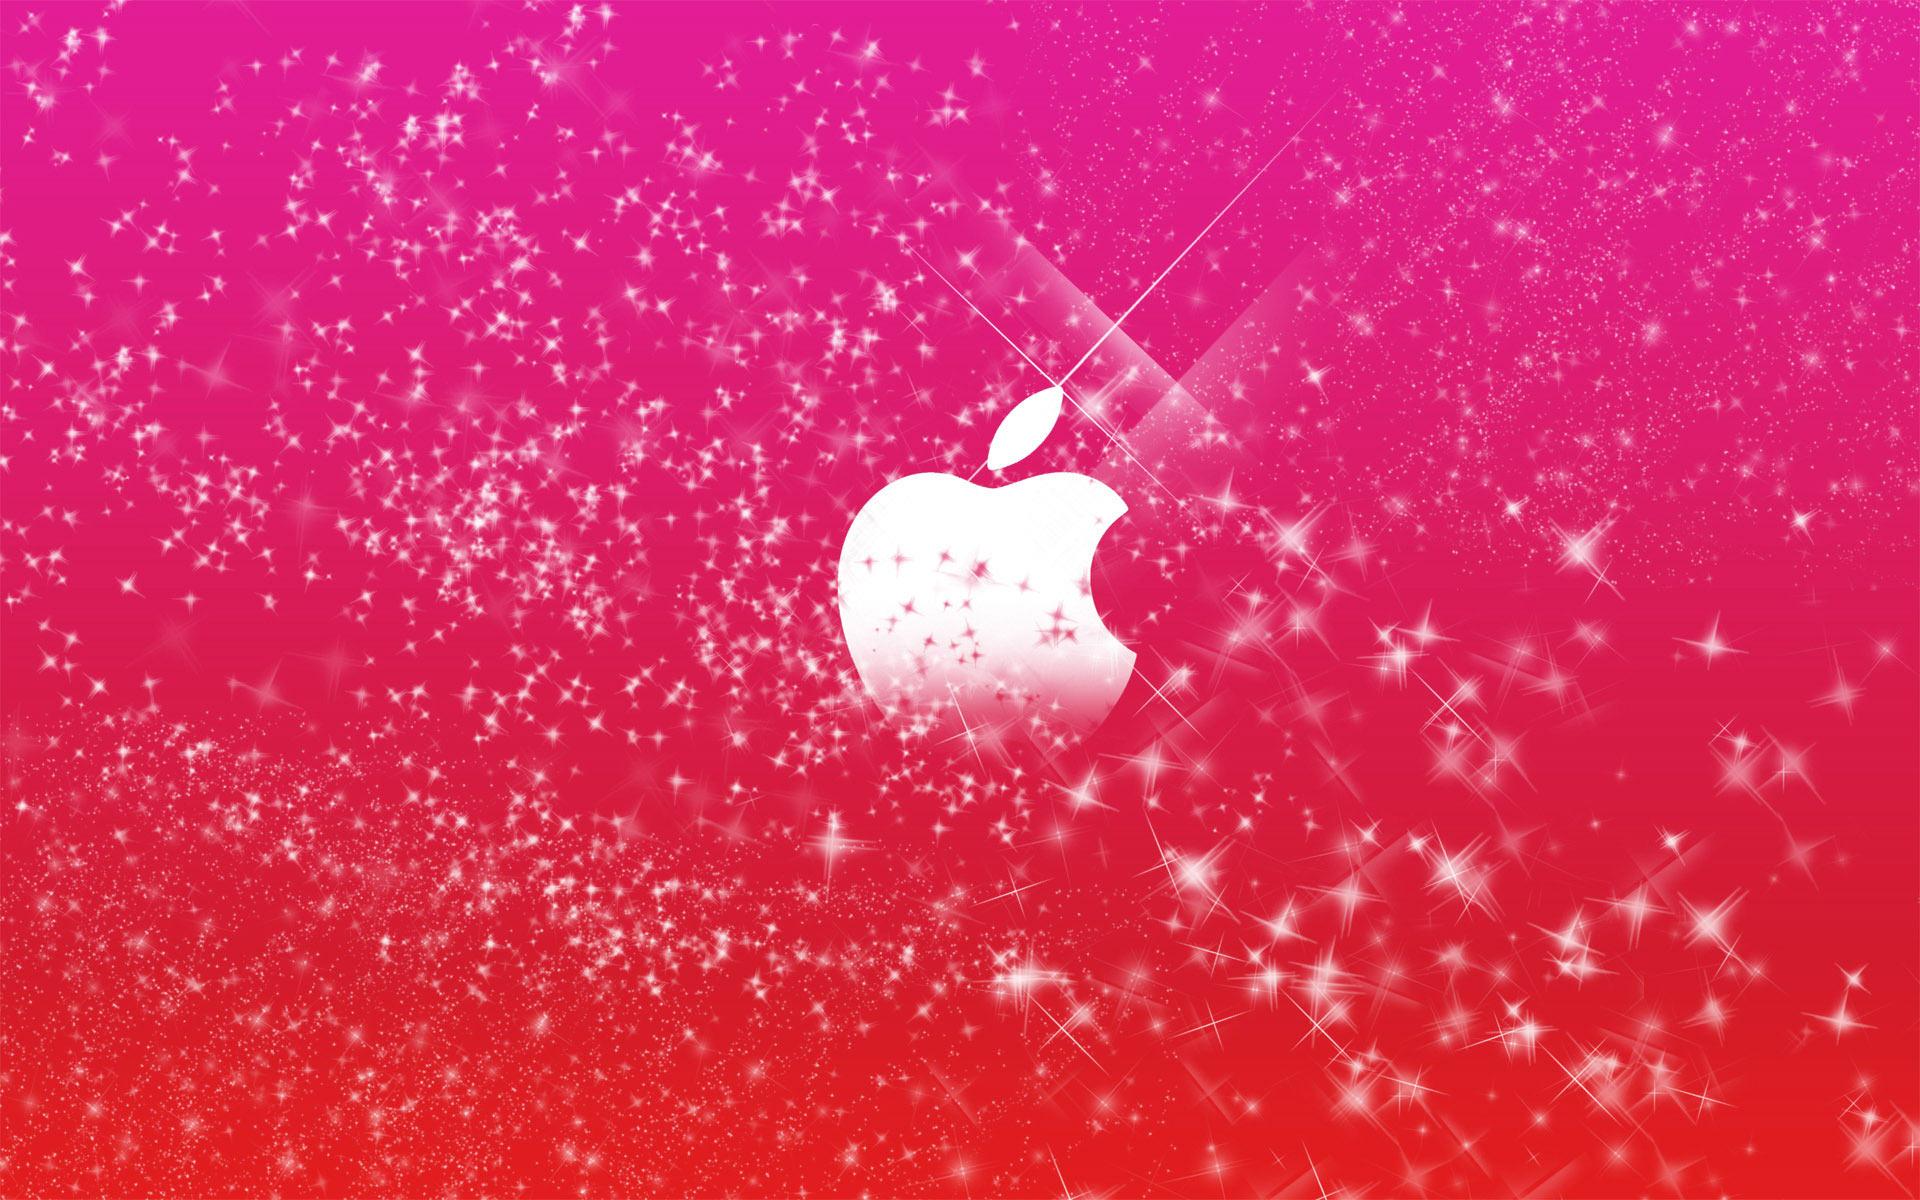 backgrounds pink desktop background cute 1920x1200 1920x1200